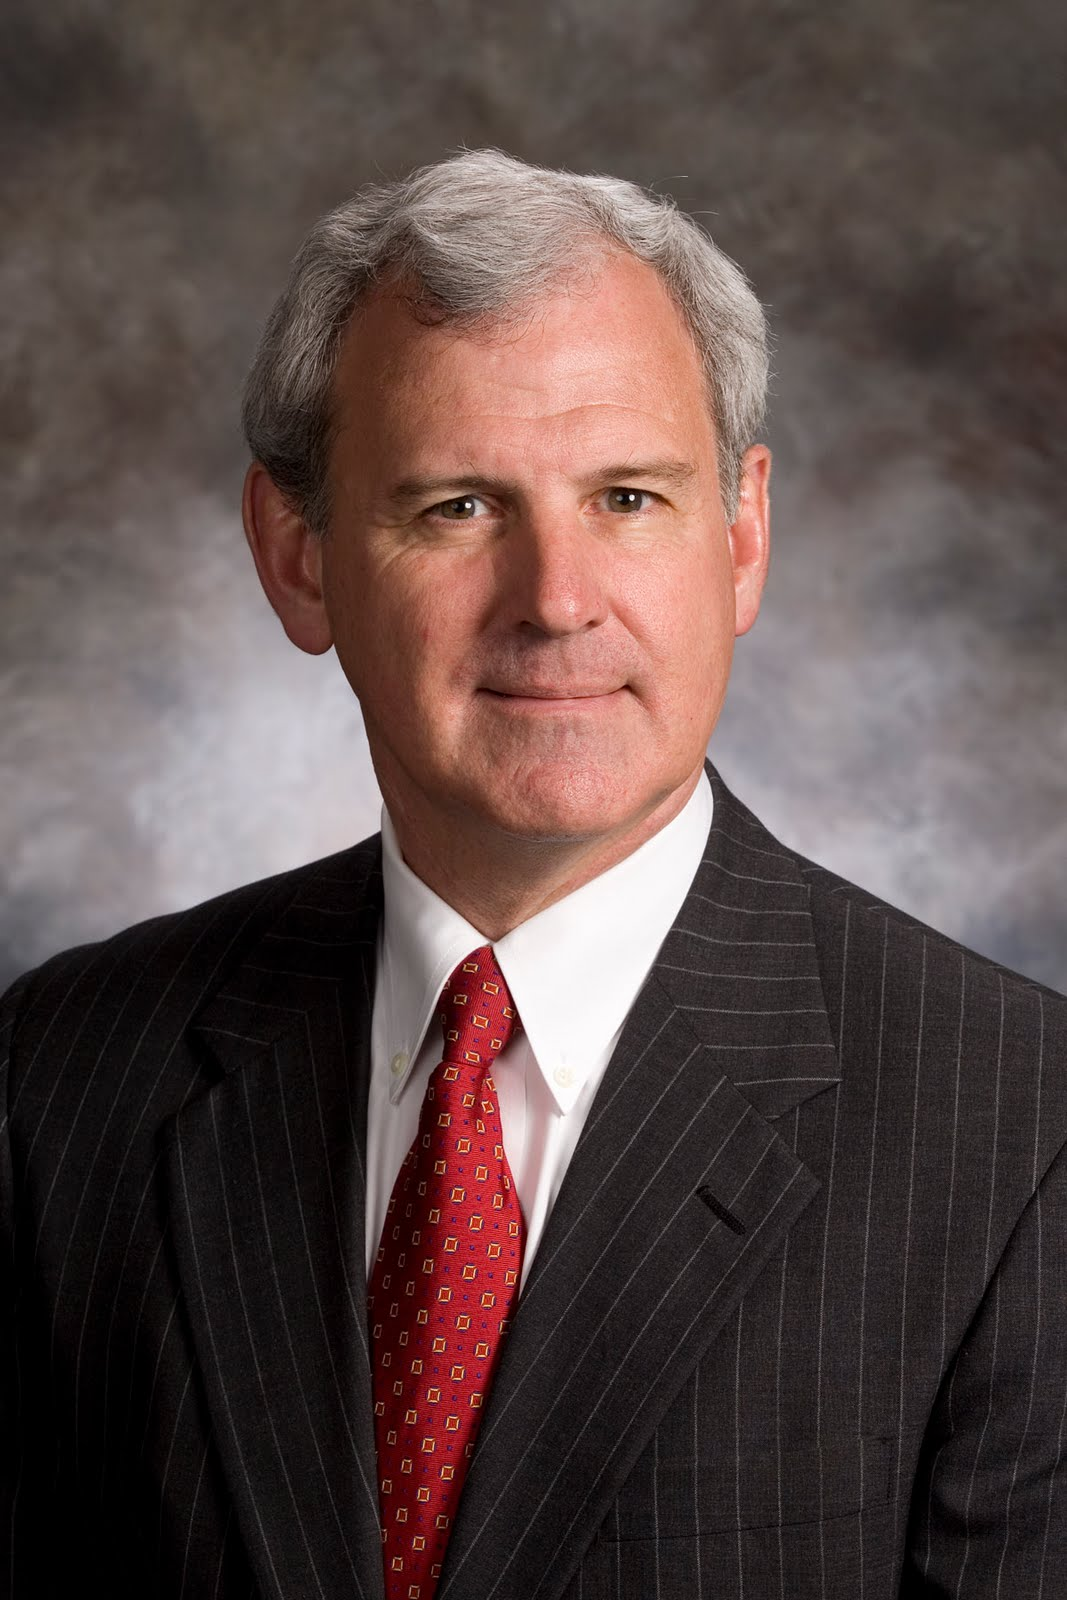 will jeb bush run for president